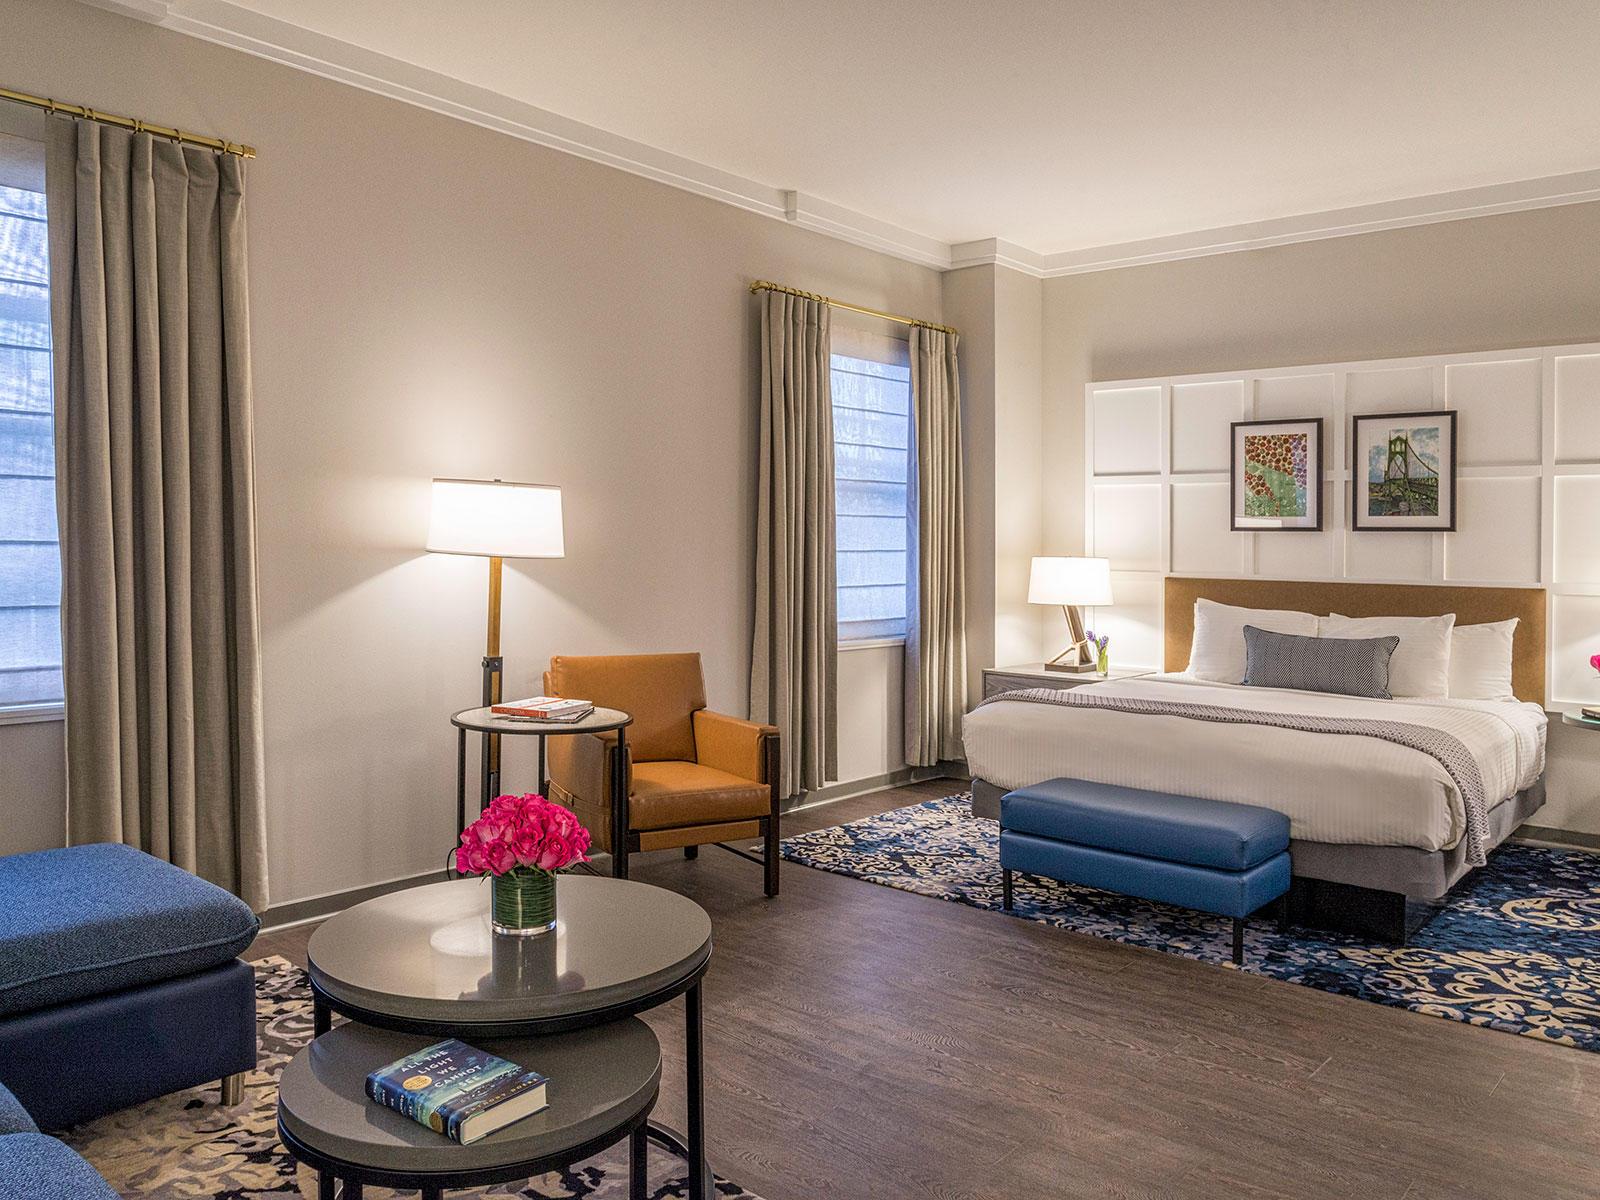 The Heathman Hotel image 3